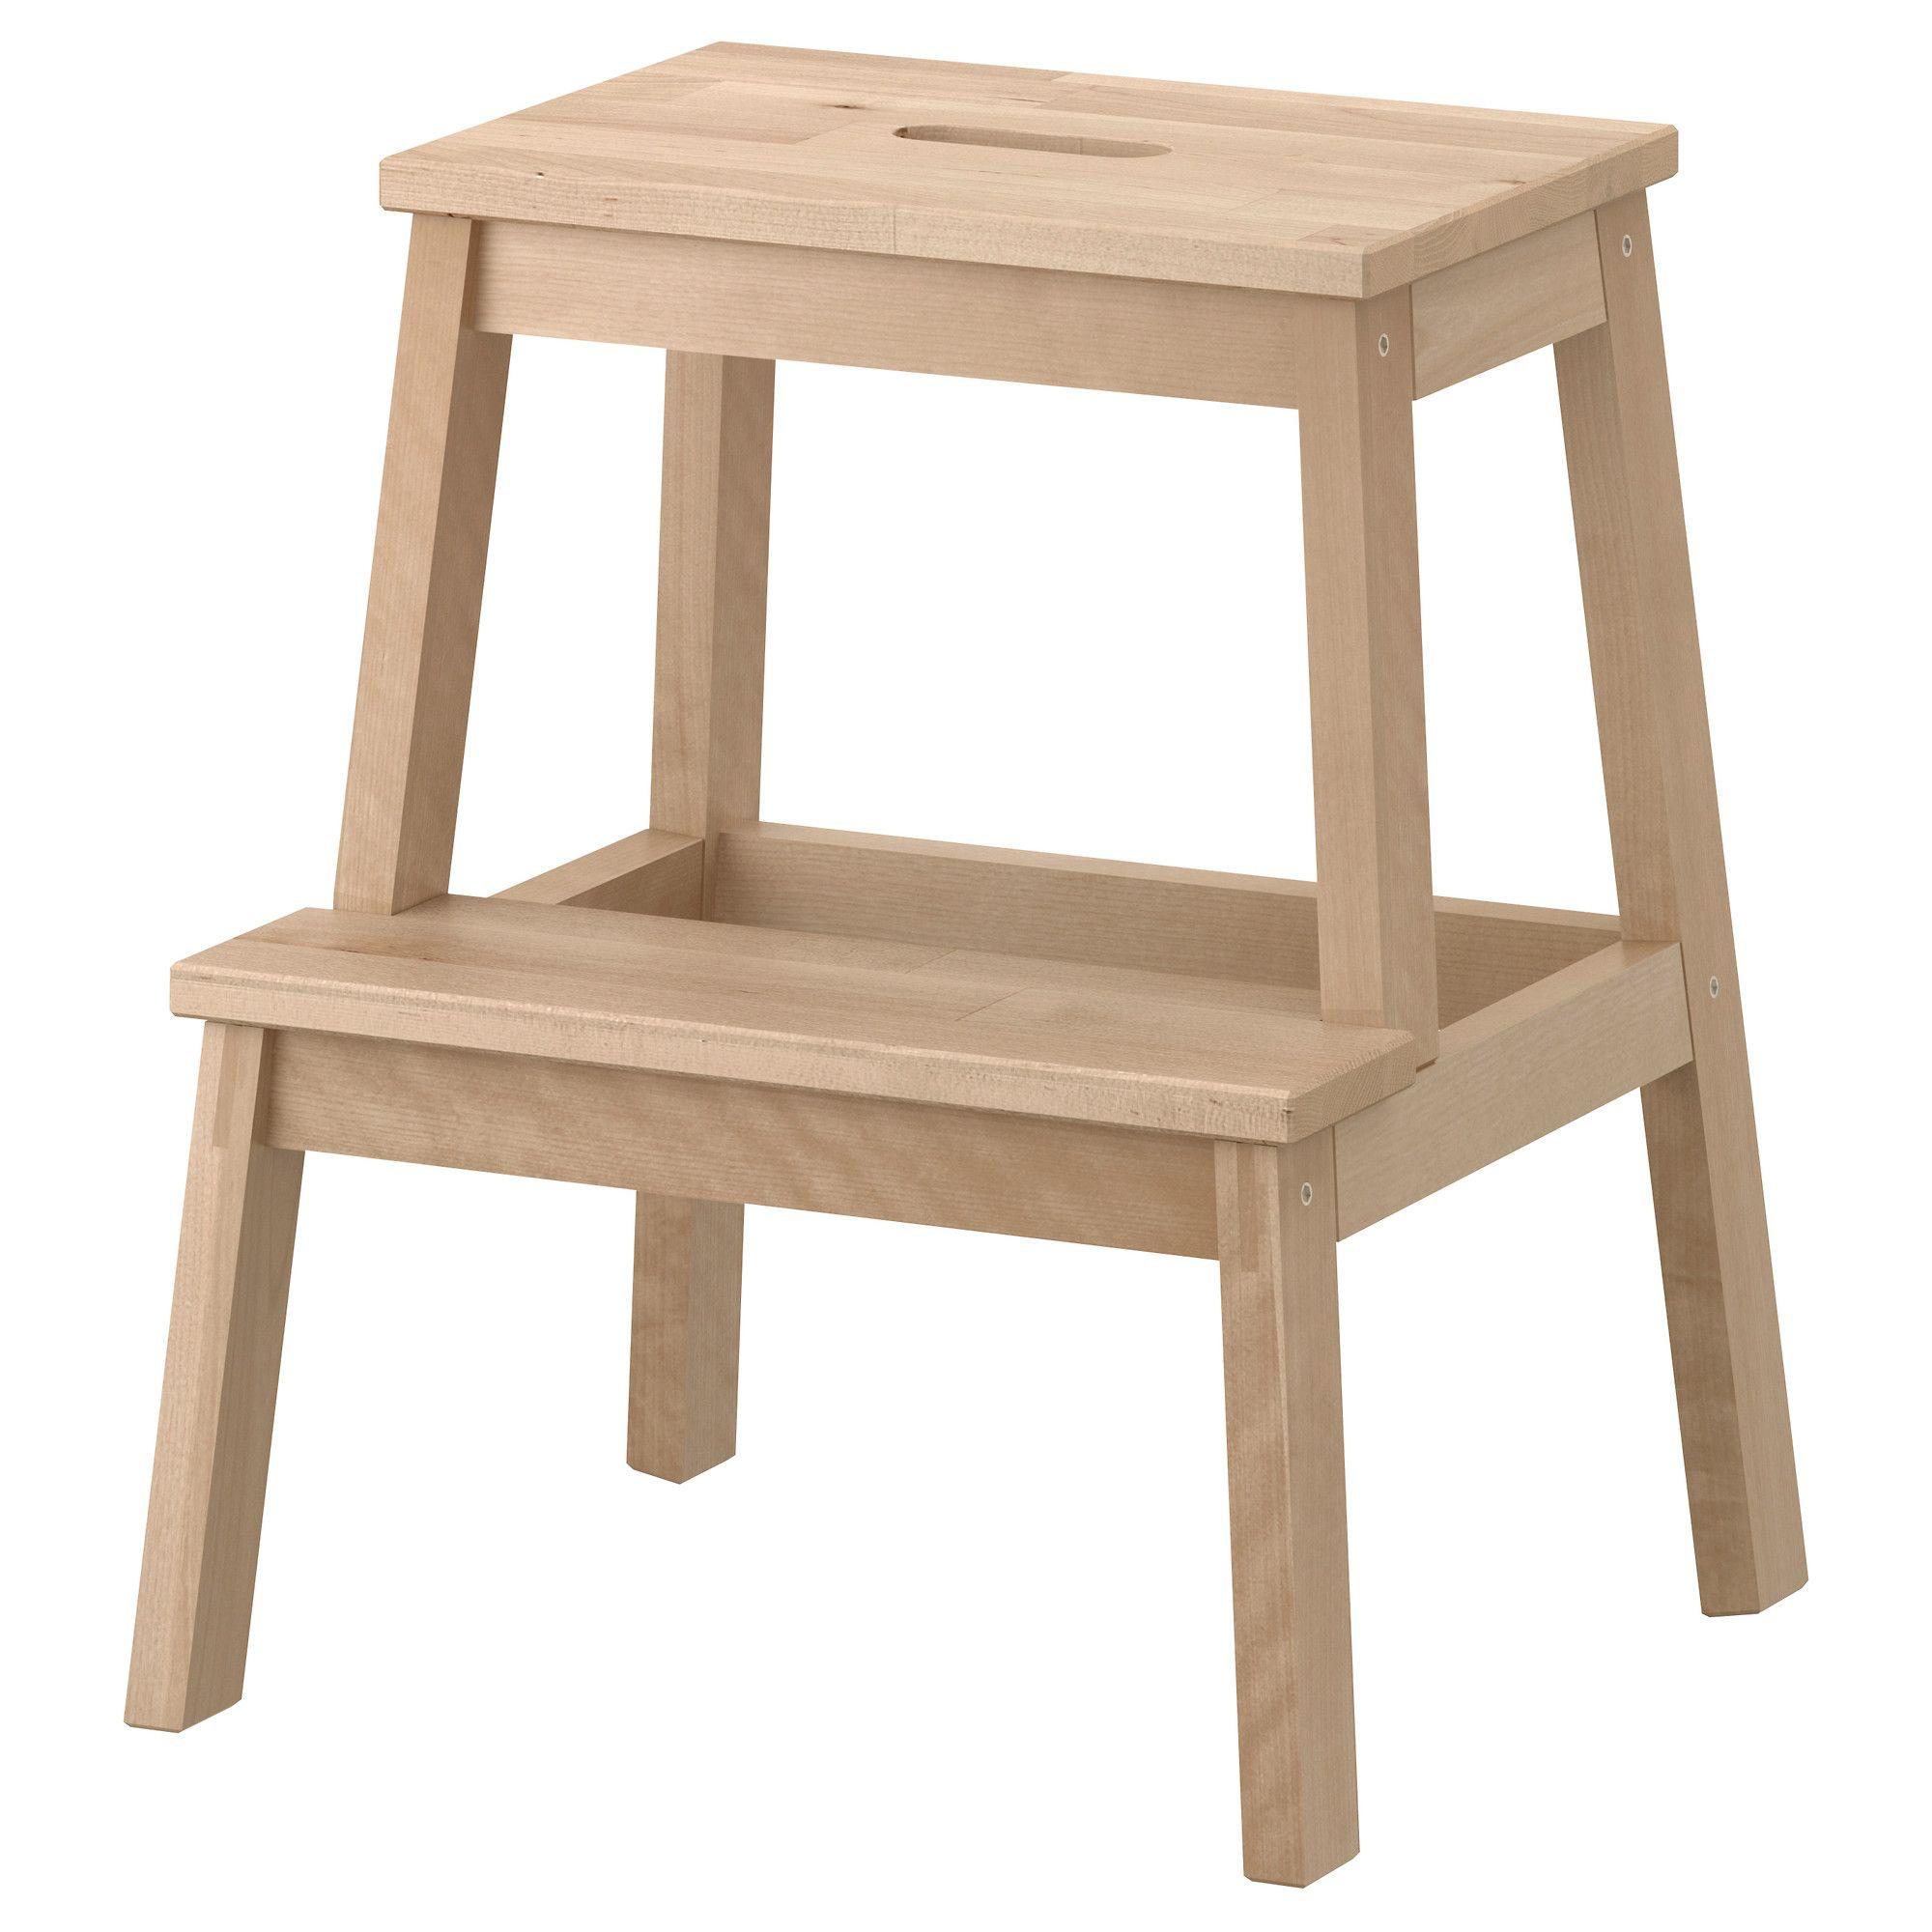 "BEKVÄM Step stool birch 19 5/8 "" (With images) Ikea"